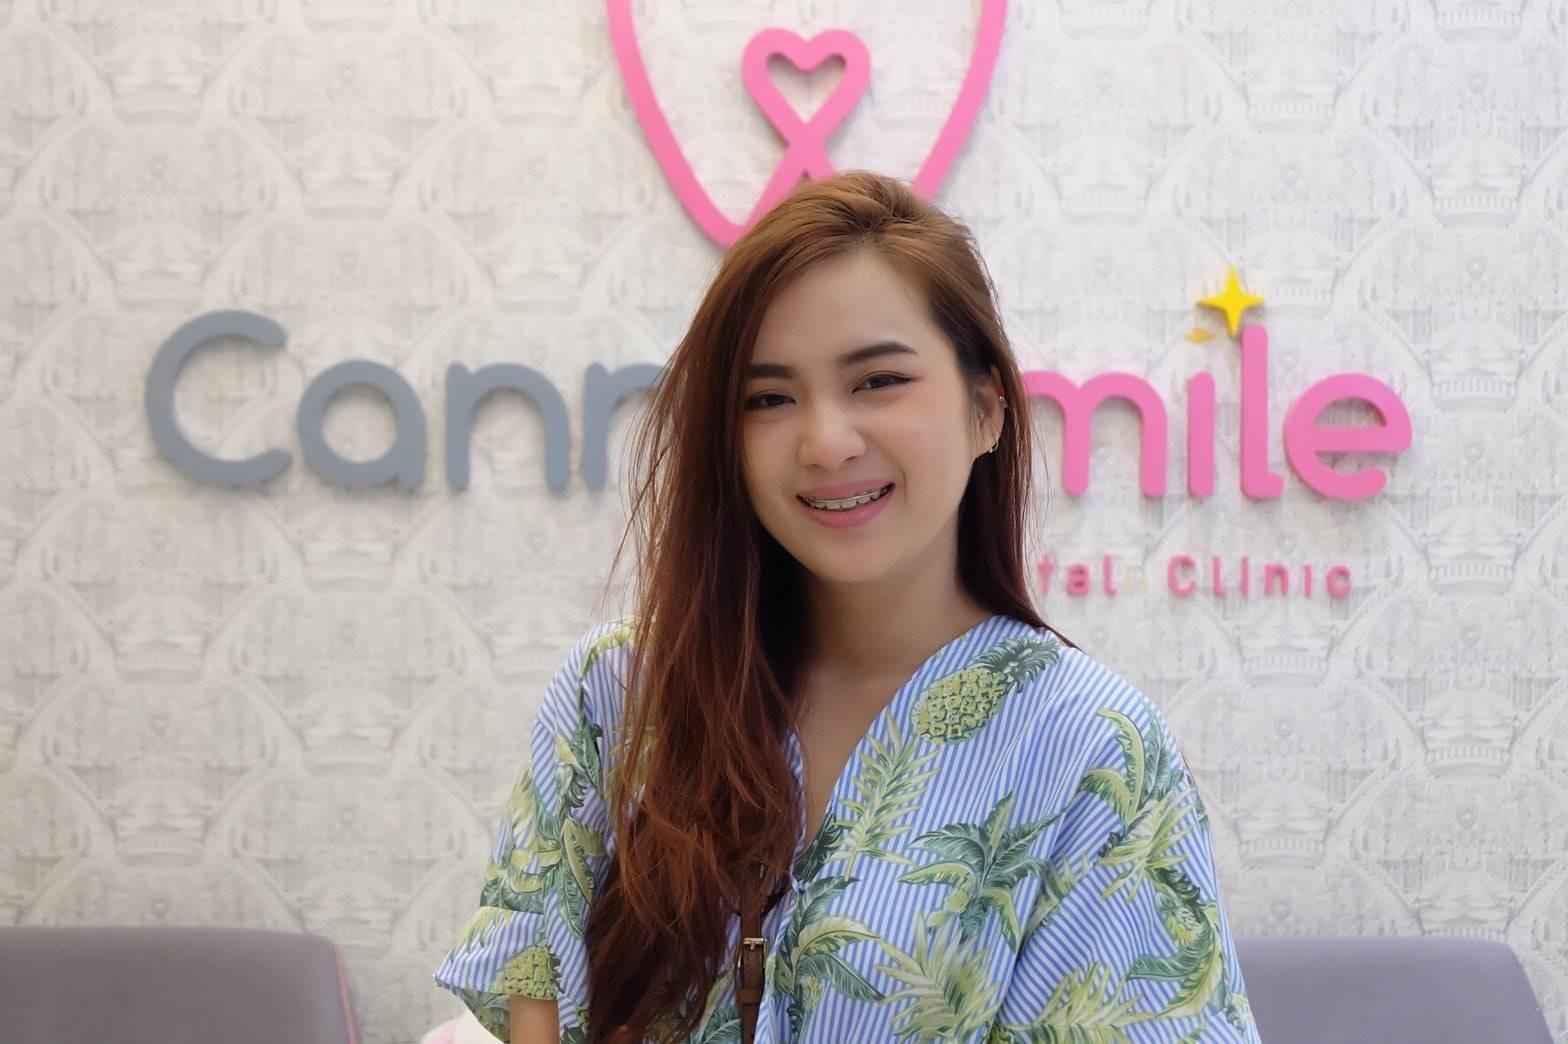 Cr. https://www.facebook.com/Canny-Smile-Dental-Clinic